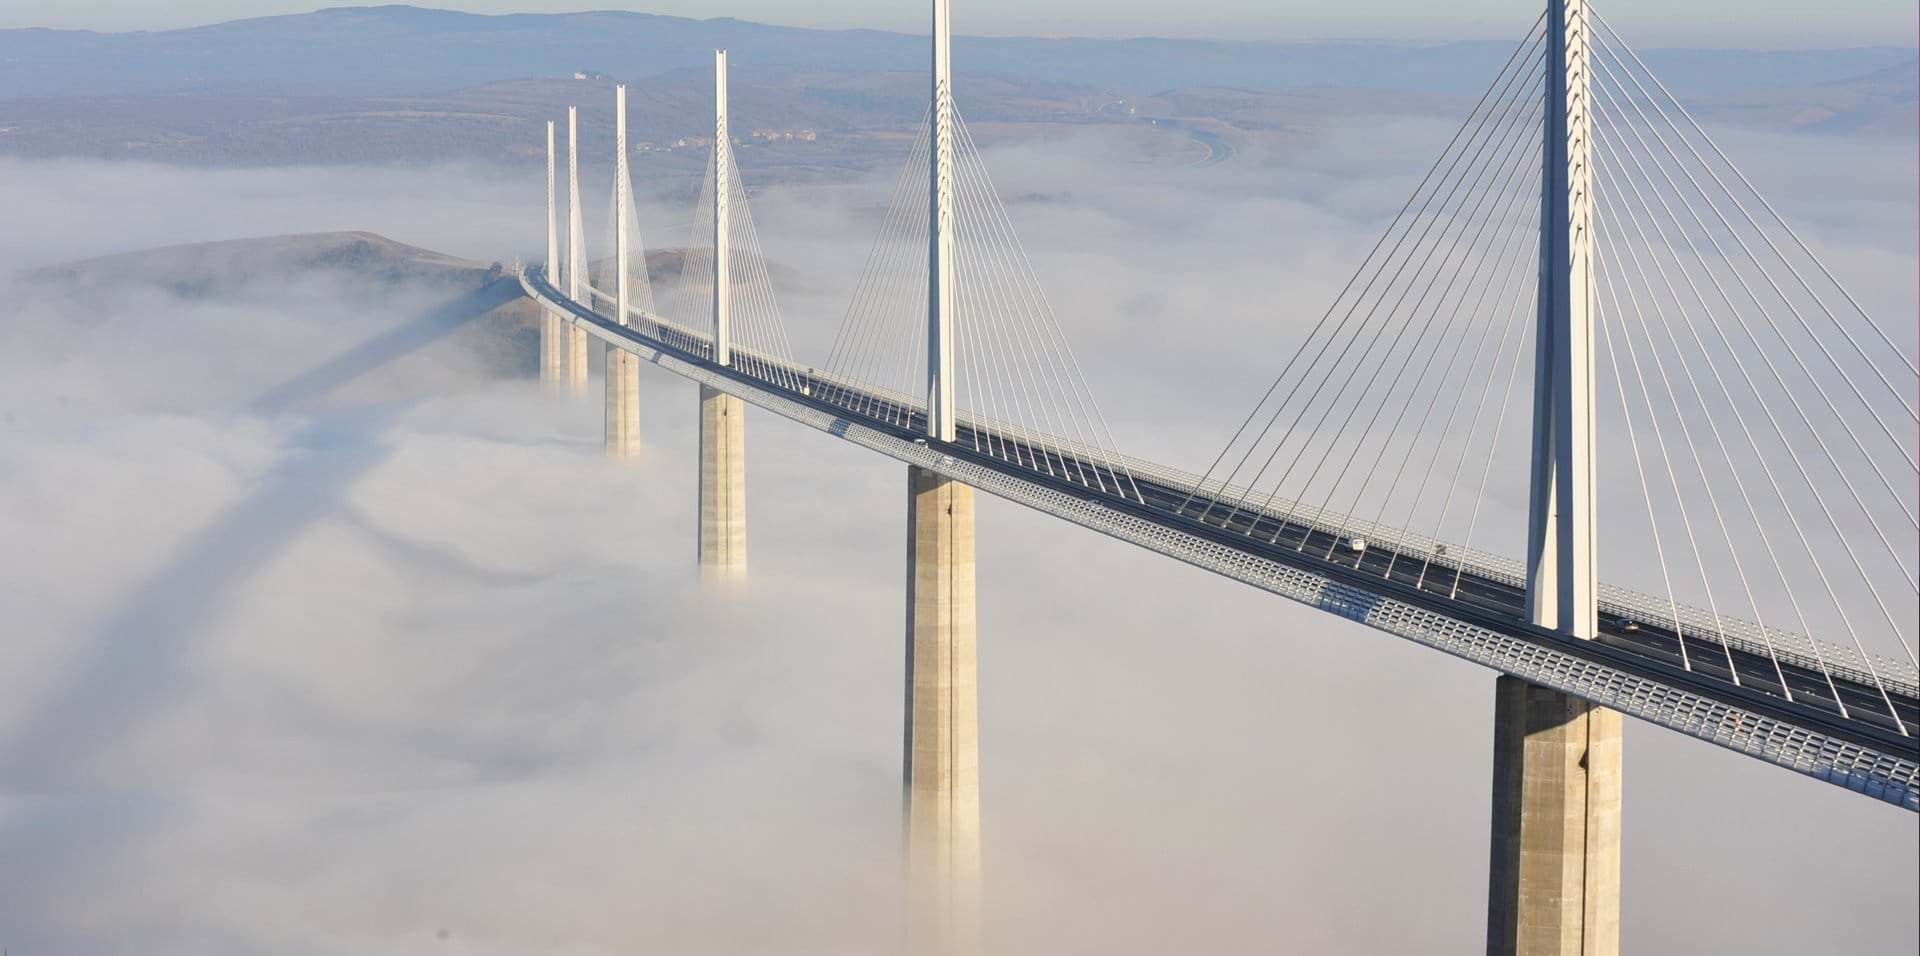 inspiring bridge designs by SkyCiv - Millau Viaduct in France